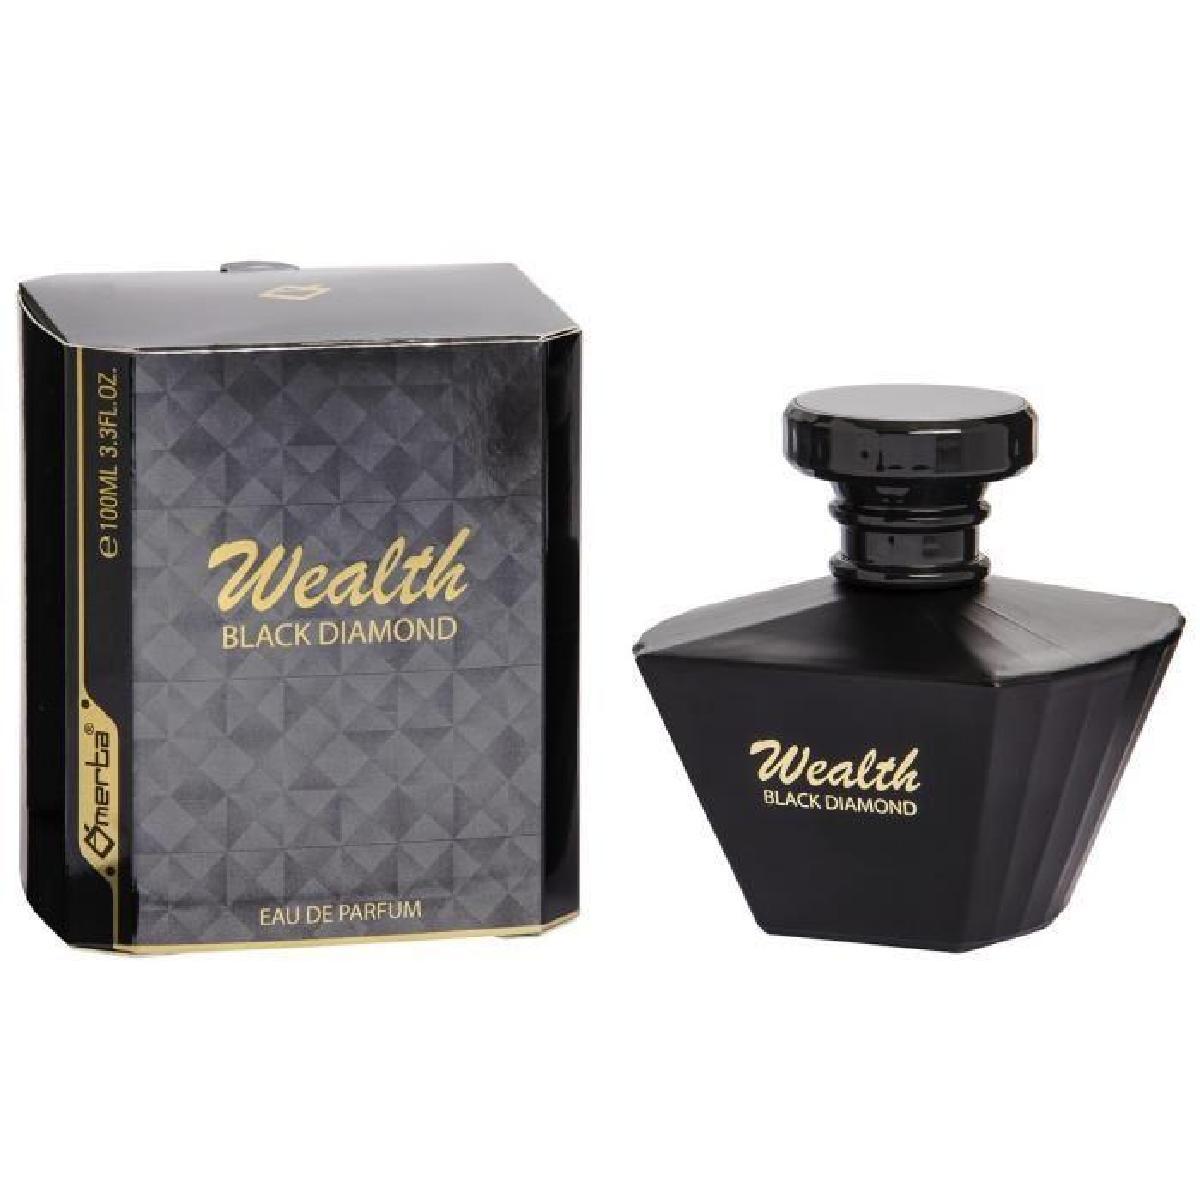 Omerta WEALTH BLACK DIAMOND, Parfémovaná voda 100ml (Alternativa parfemu Lancome La Nuit Tresor)